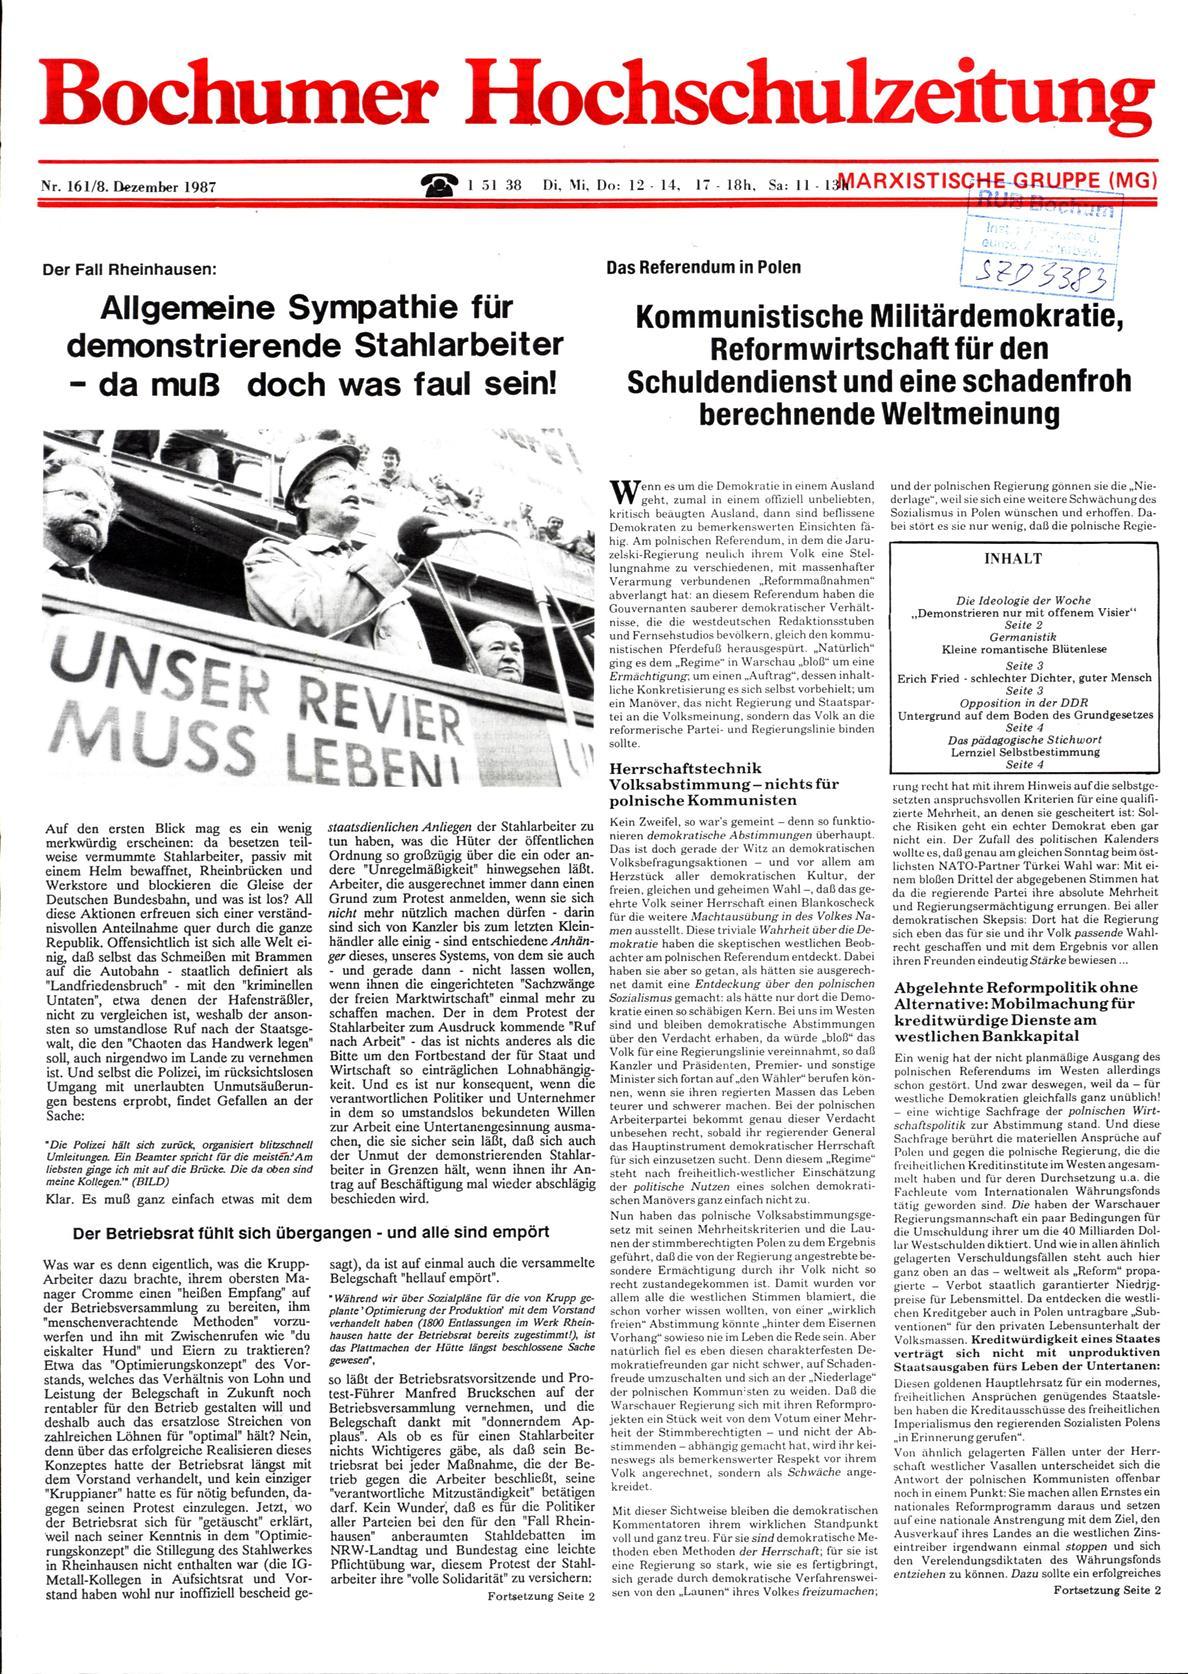 Bochum_BHZ_19871208_161_001